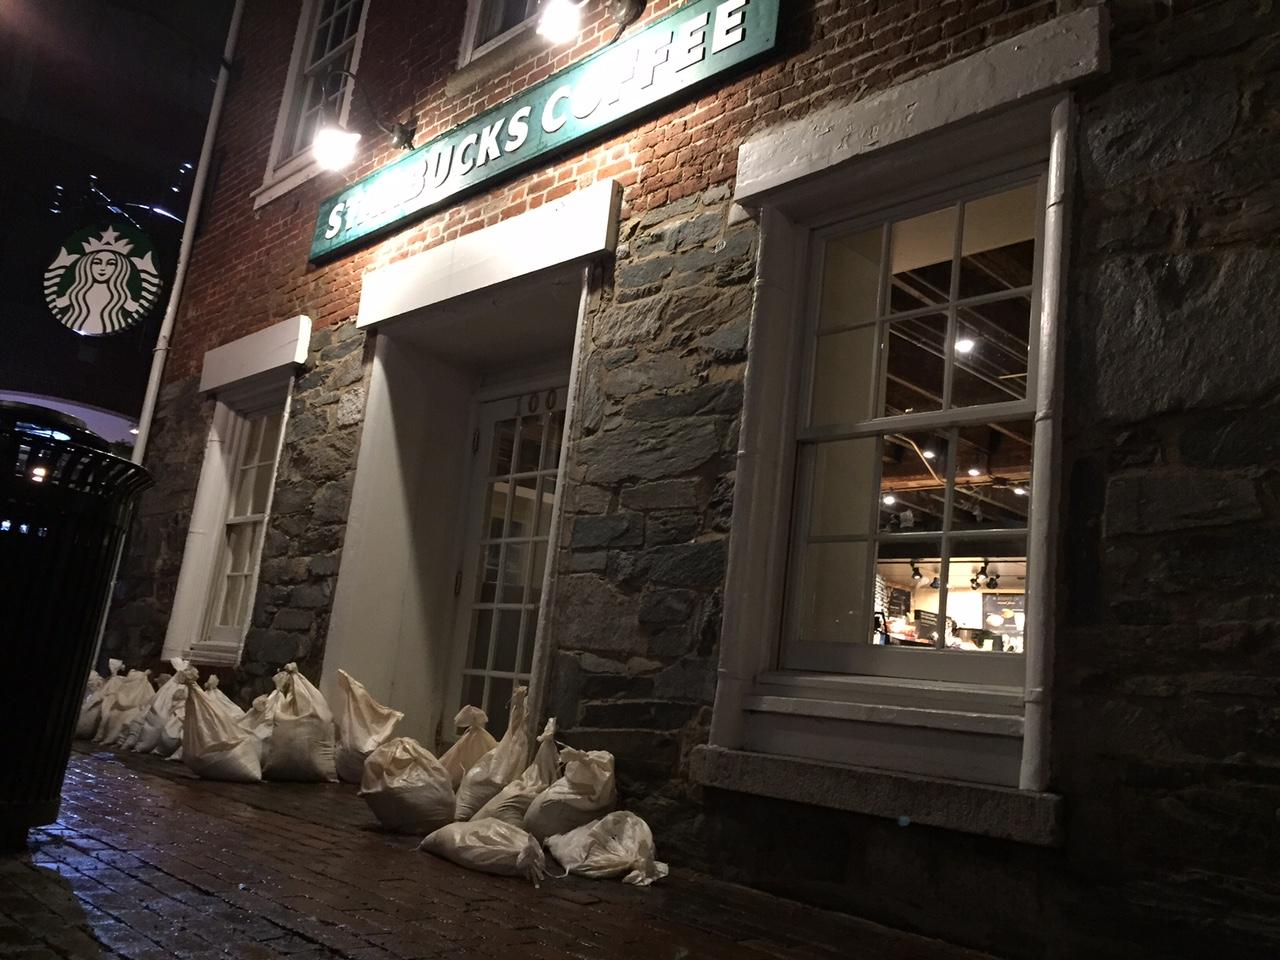 Alexandria readies for flooding, offers sandbags